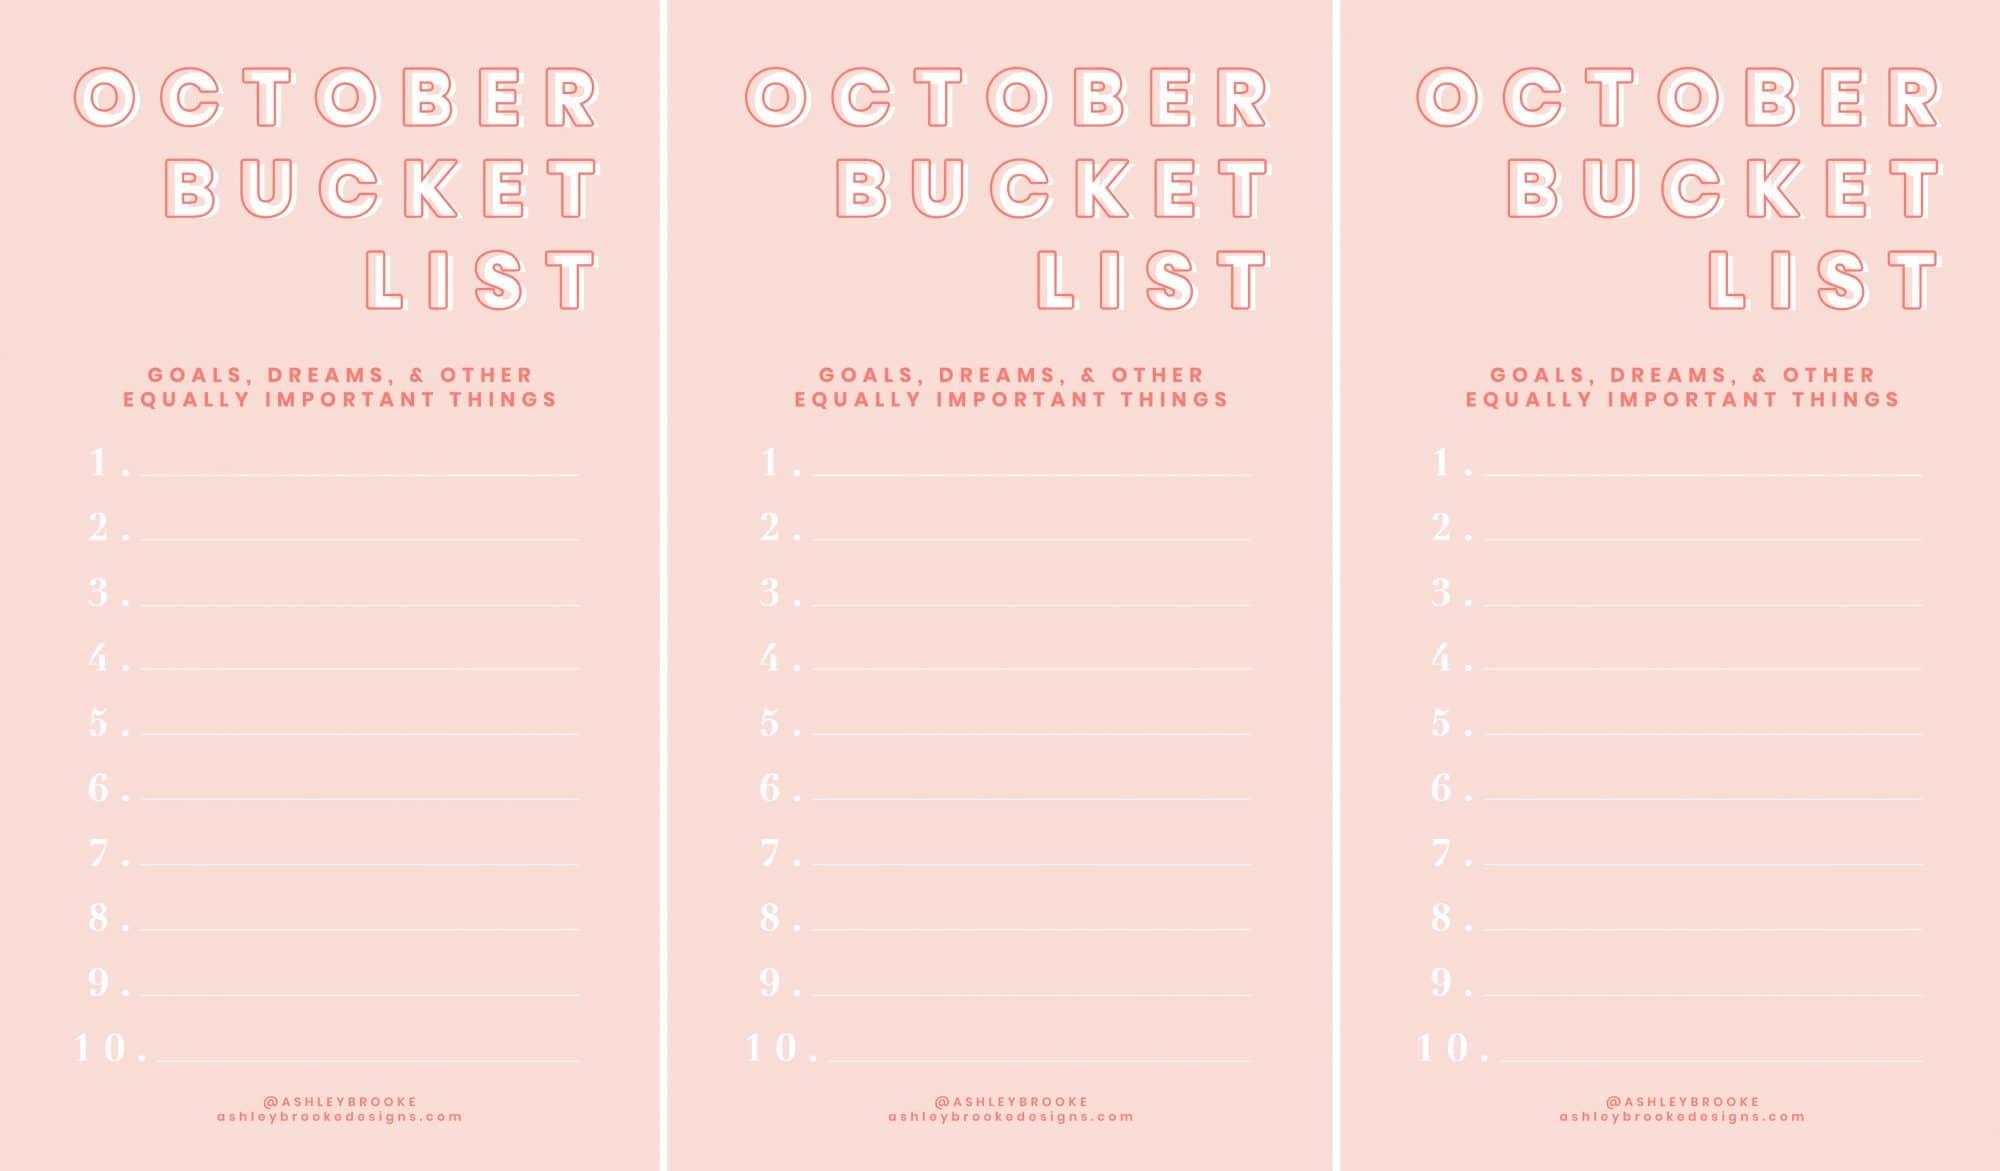 Ashley Brooke - Printable Image - October Bucket List Download